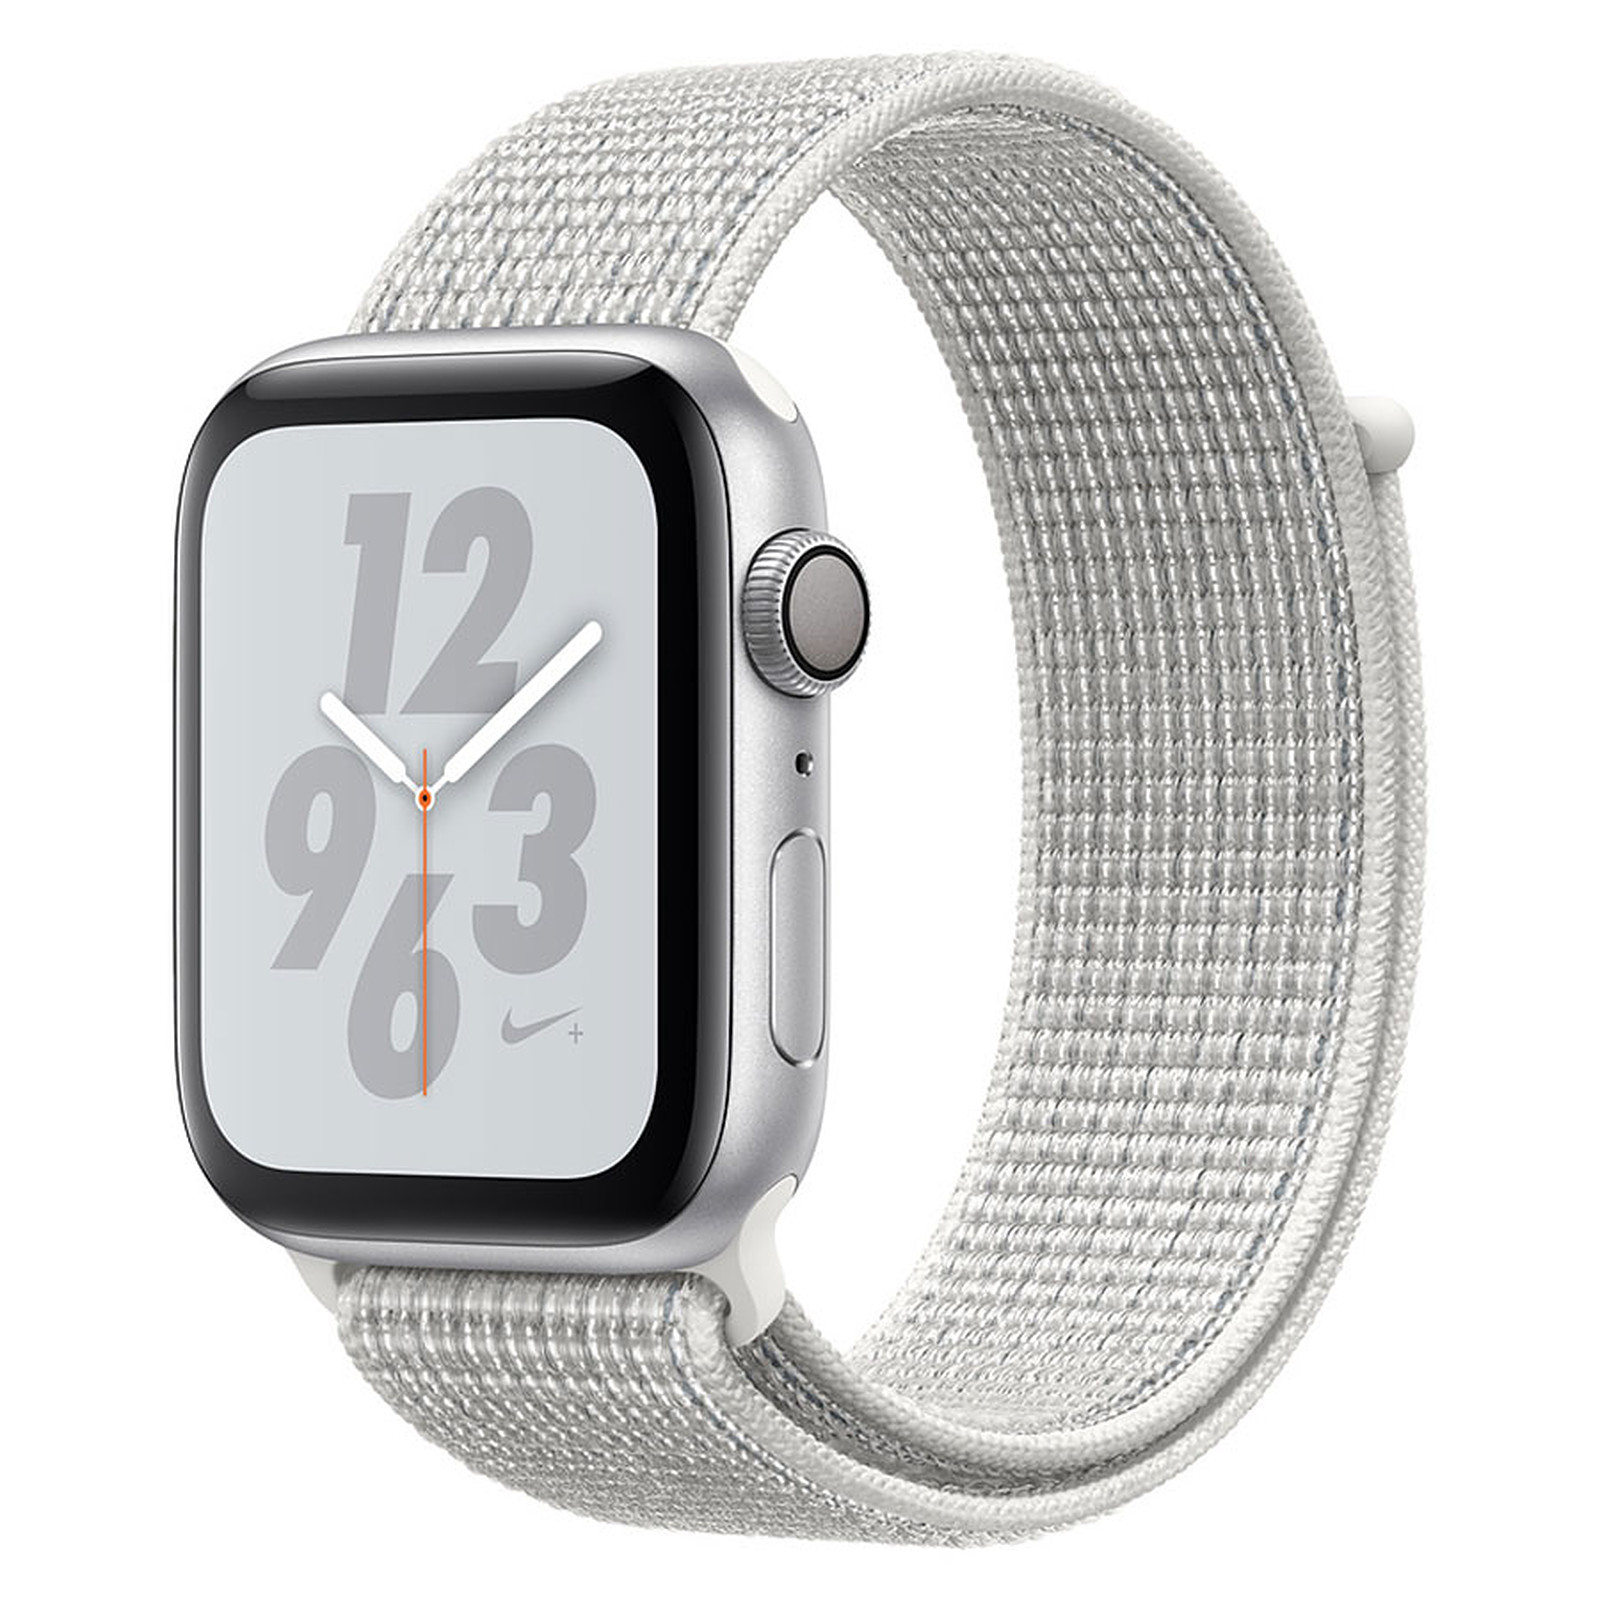 Apple Watch Nike+ Serie 4 GPS Aluminio Aluminio Plata Hebilla Deportiva Blanca 40 mm